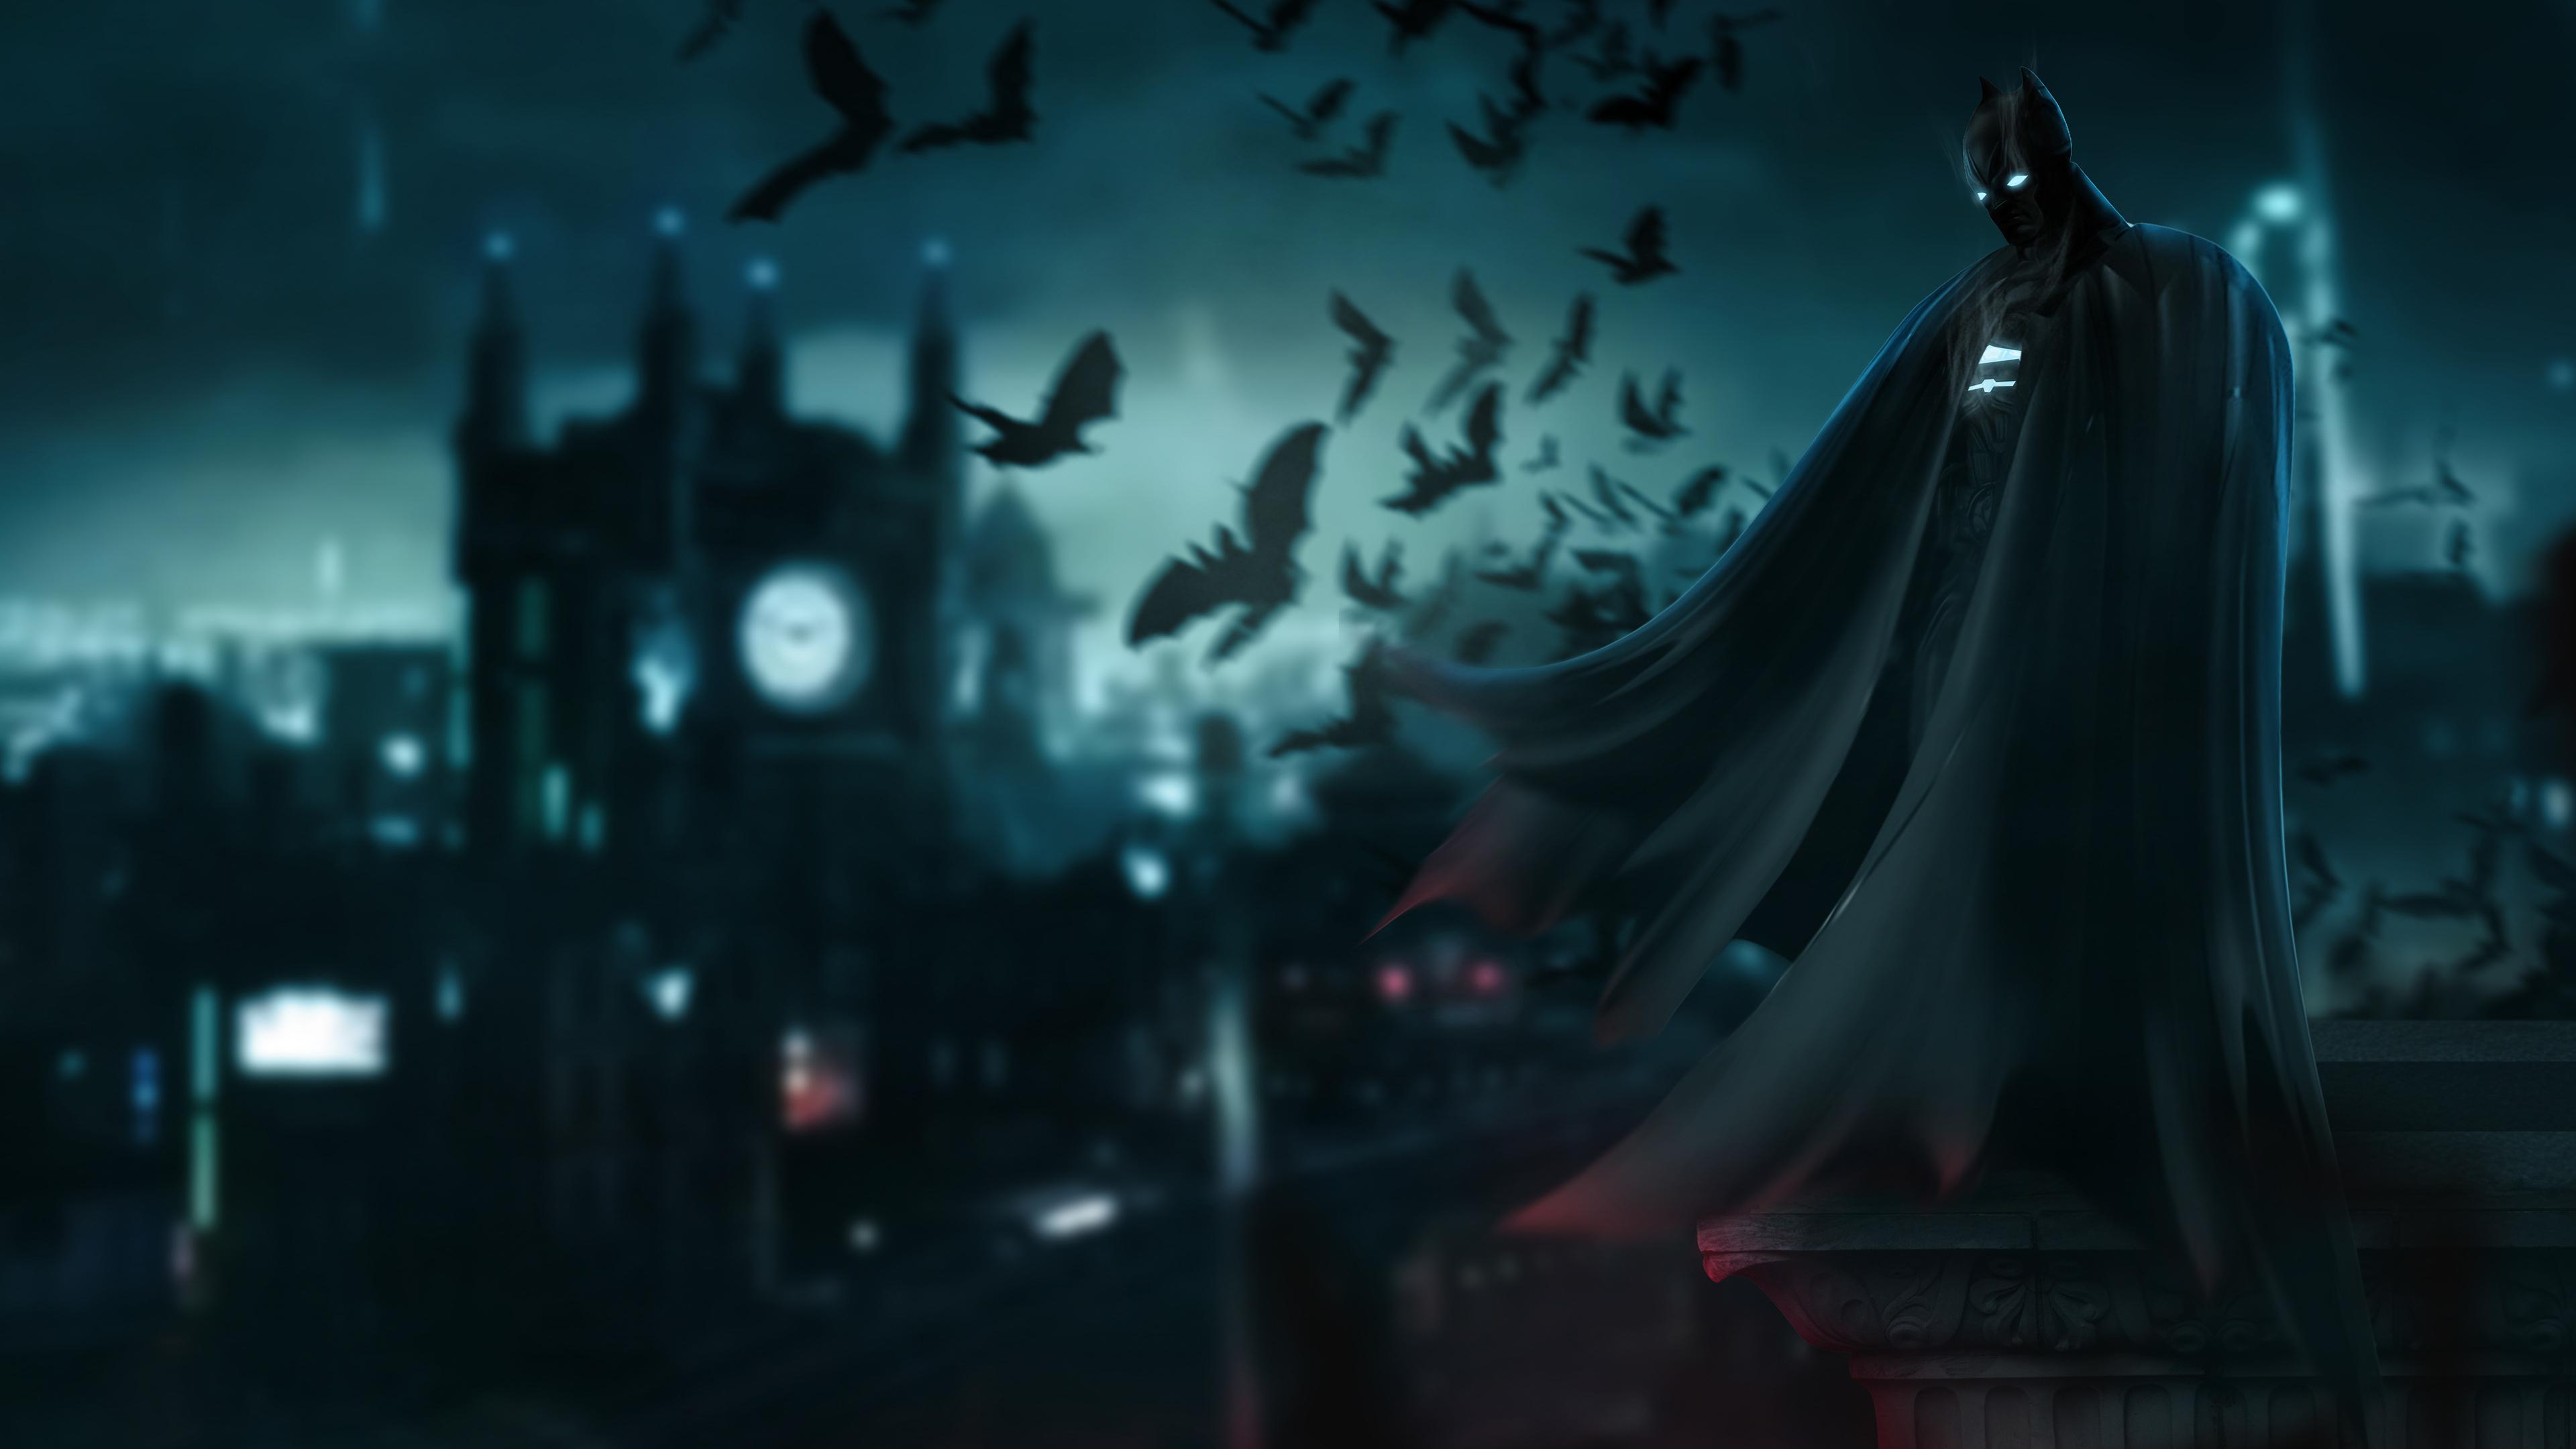 Batman 4k Ultra HD Wallpaper | Background Image ...